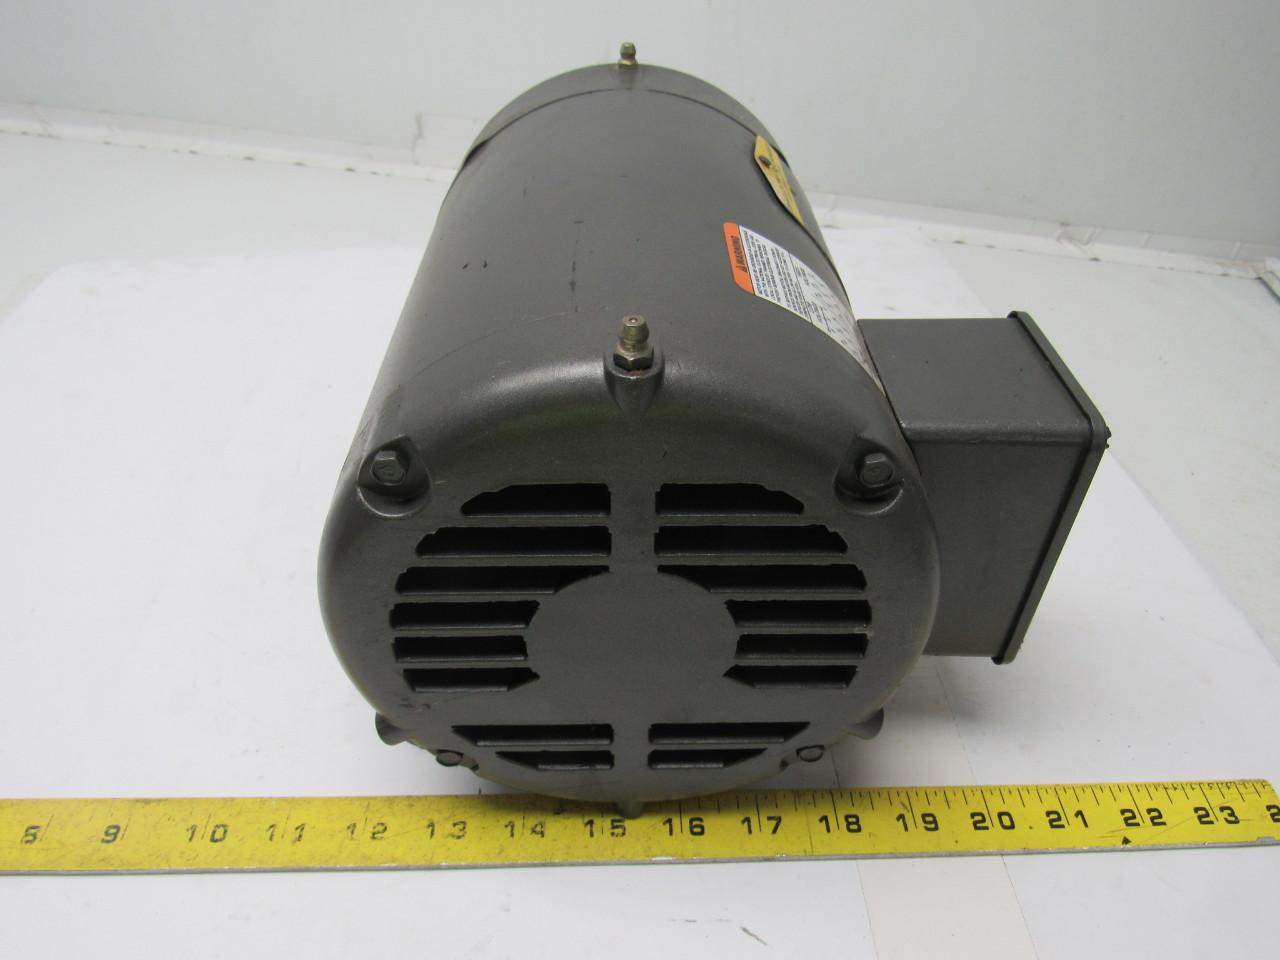 Baldor Jmm3155t 2 Hp Electric Motor 208 230 460v 3450rpm